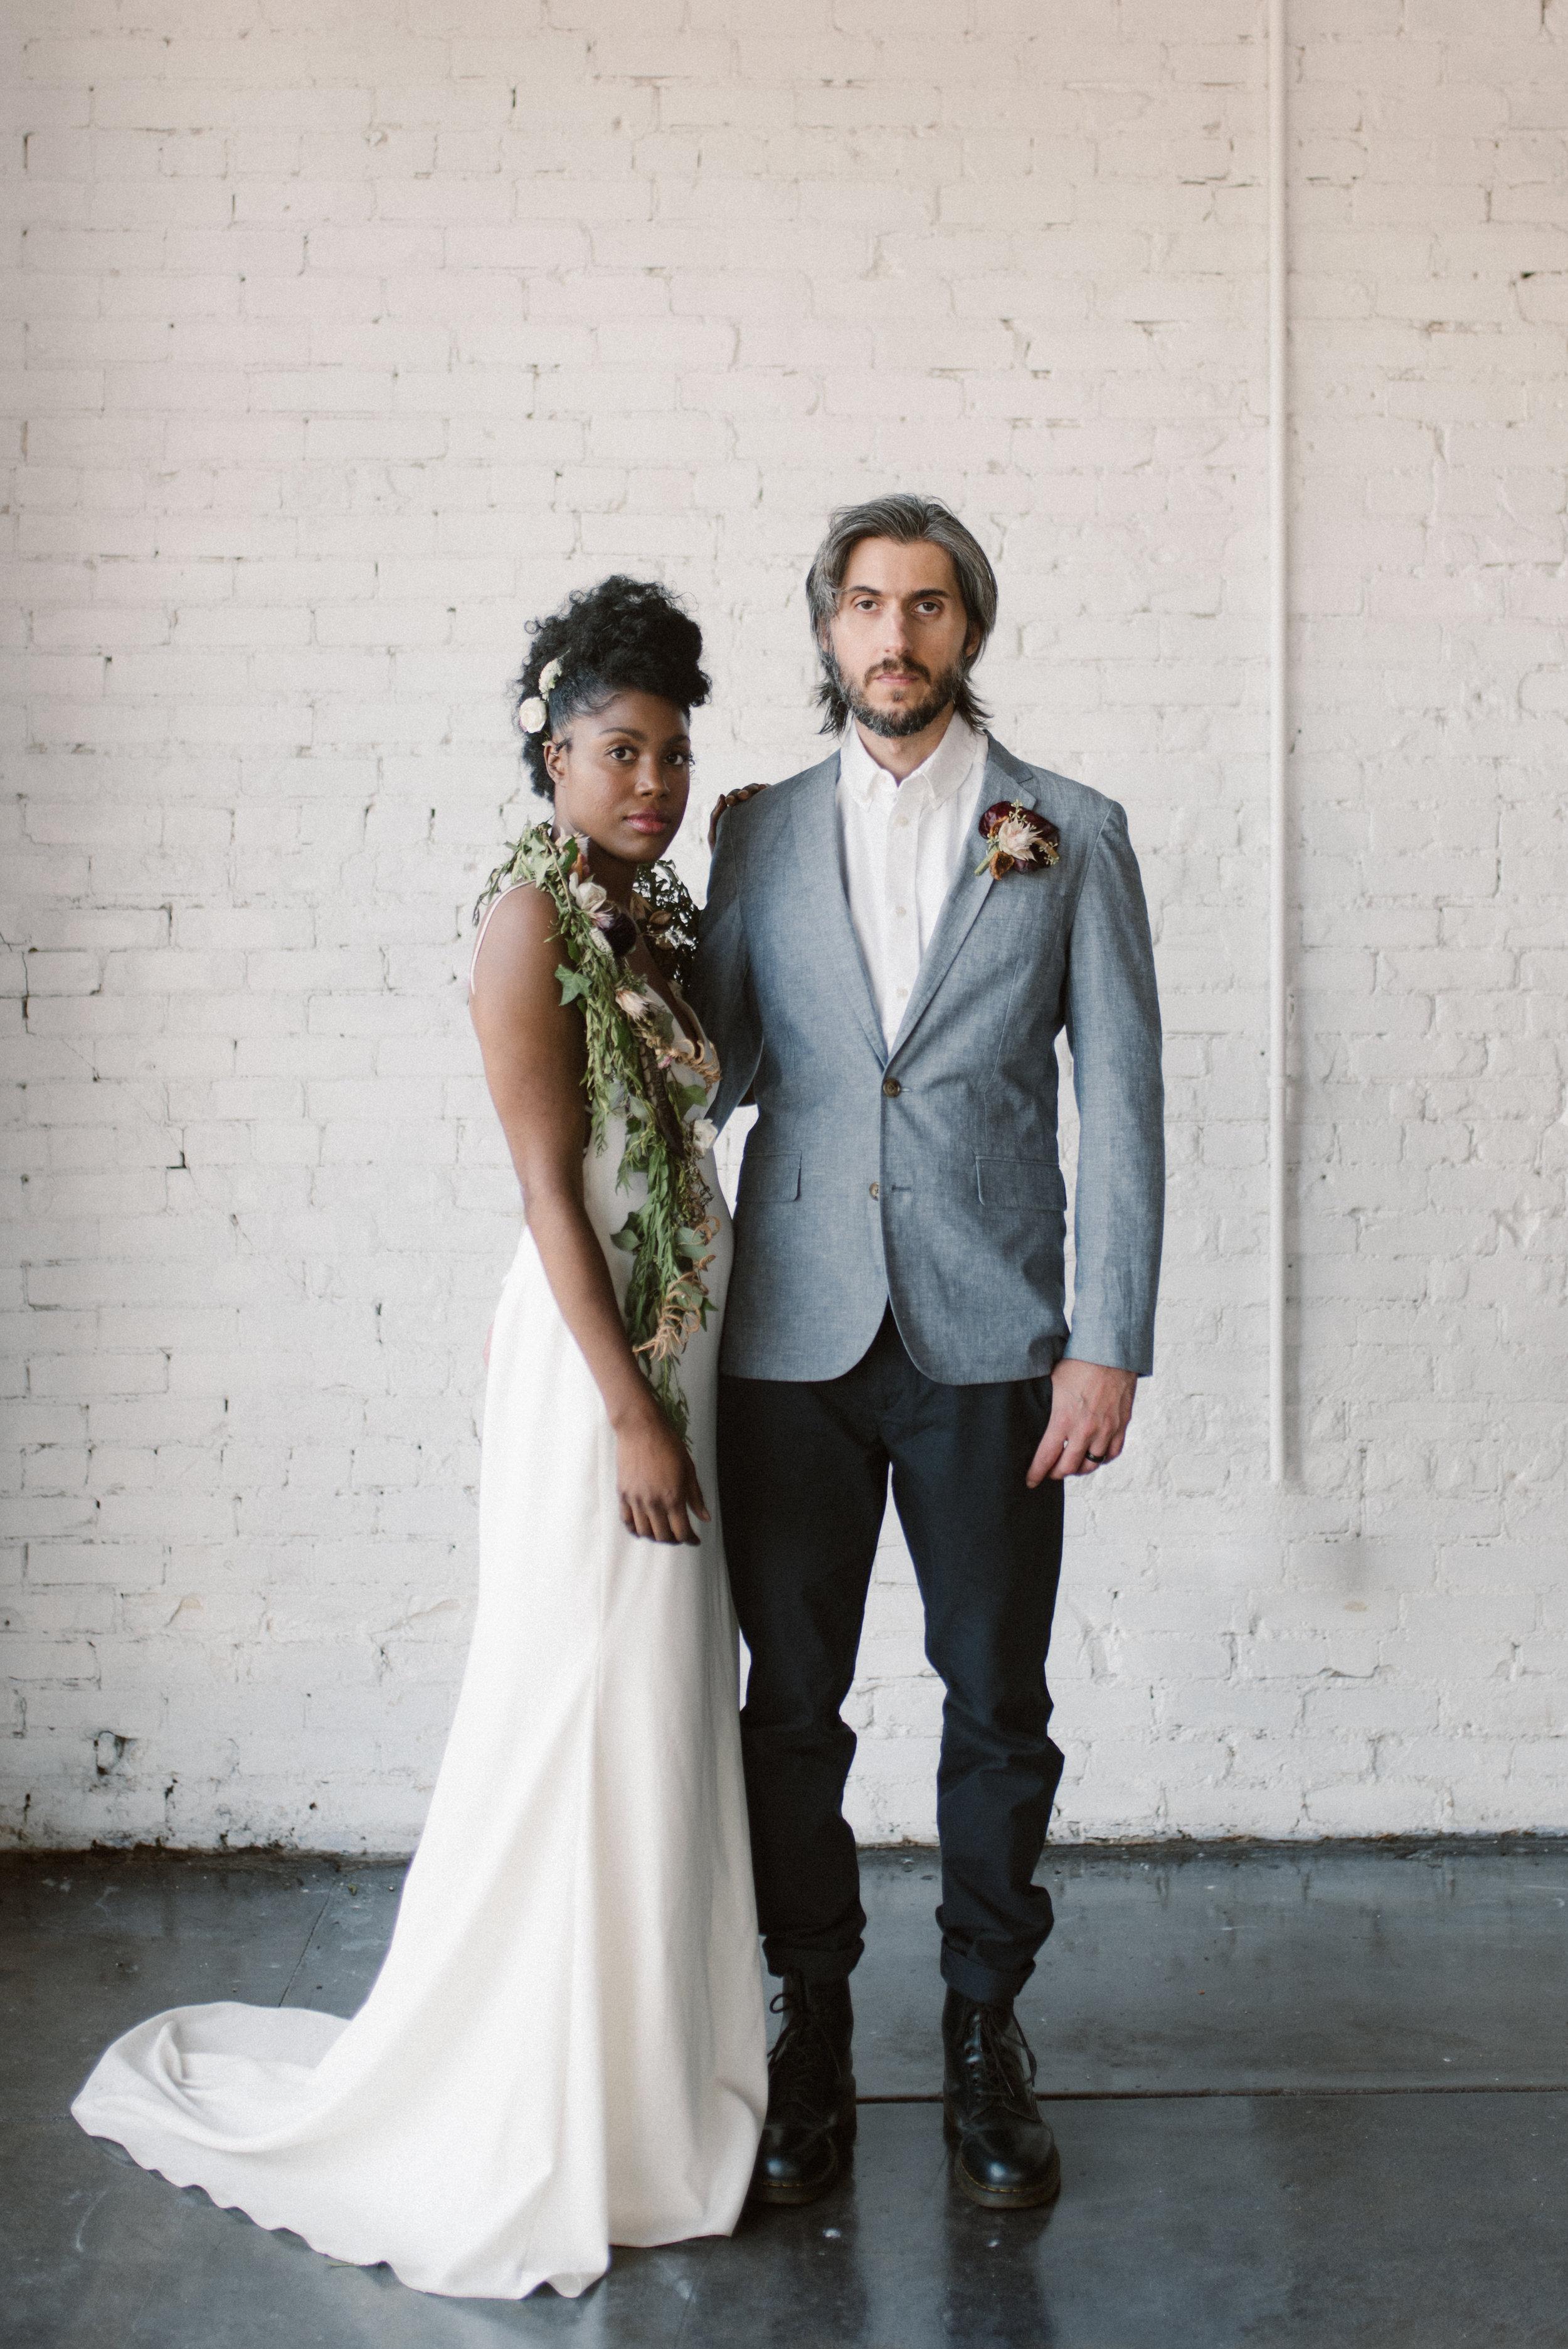 haus-820-minimal-editorial-wedding-styled-shoot-41.jpg